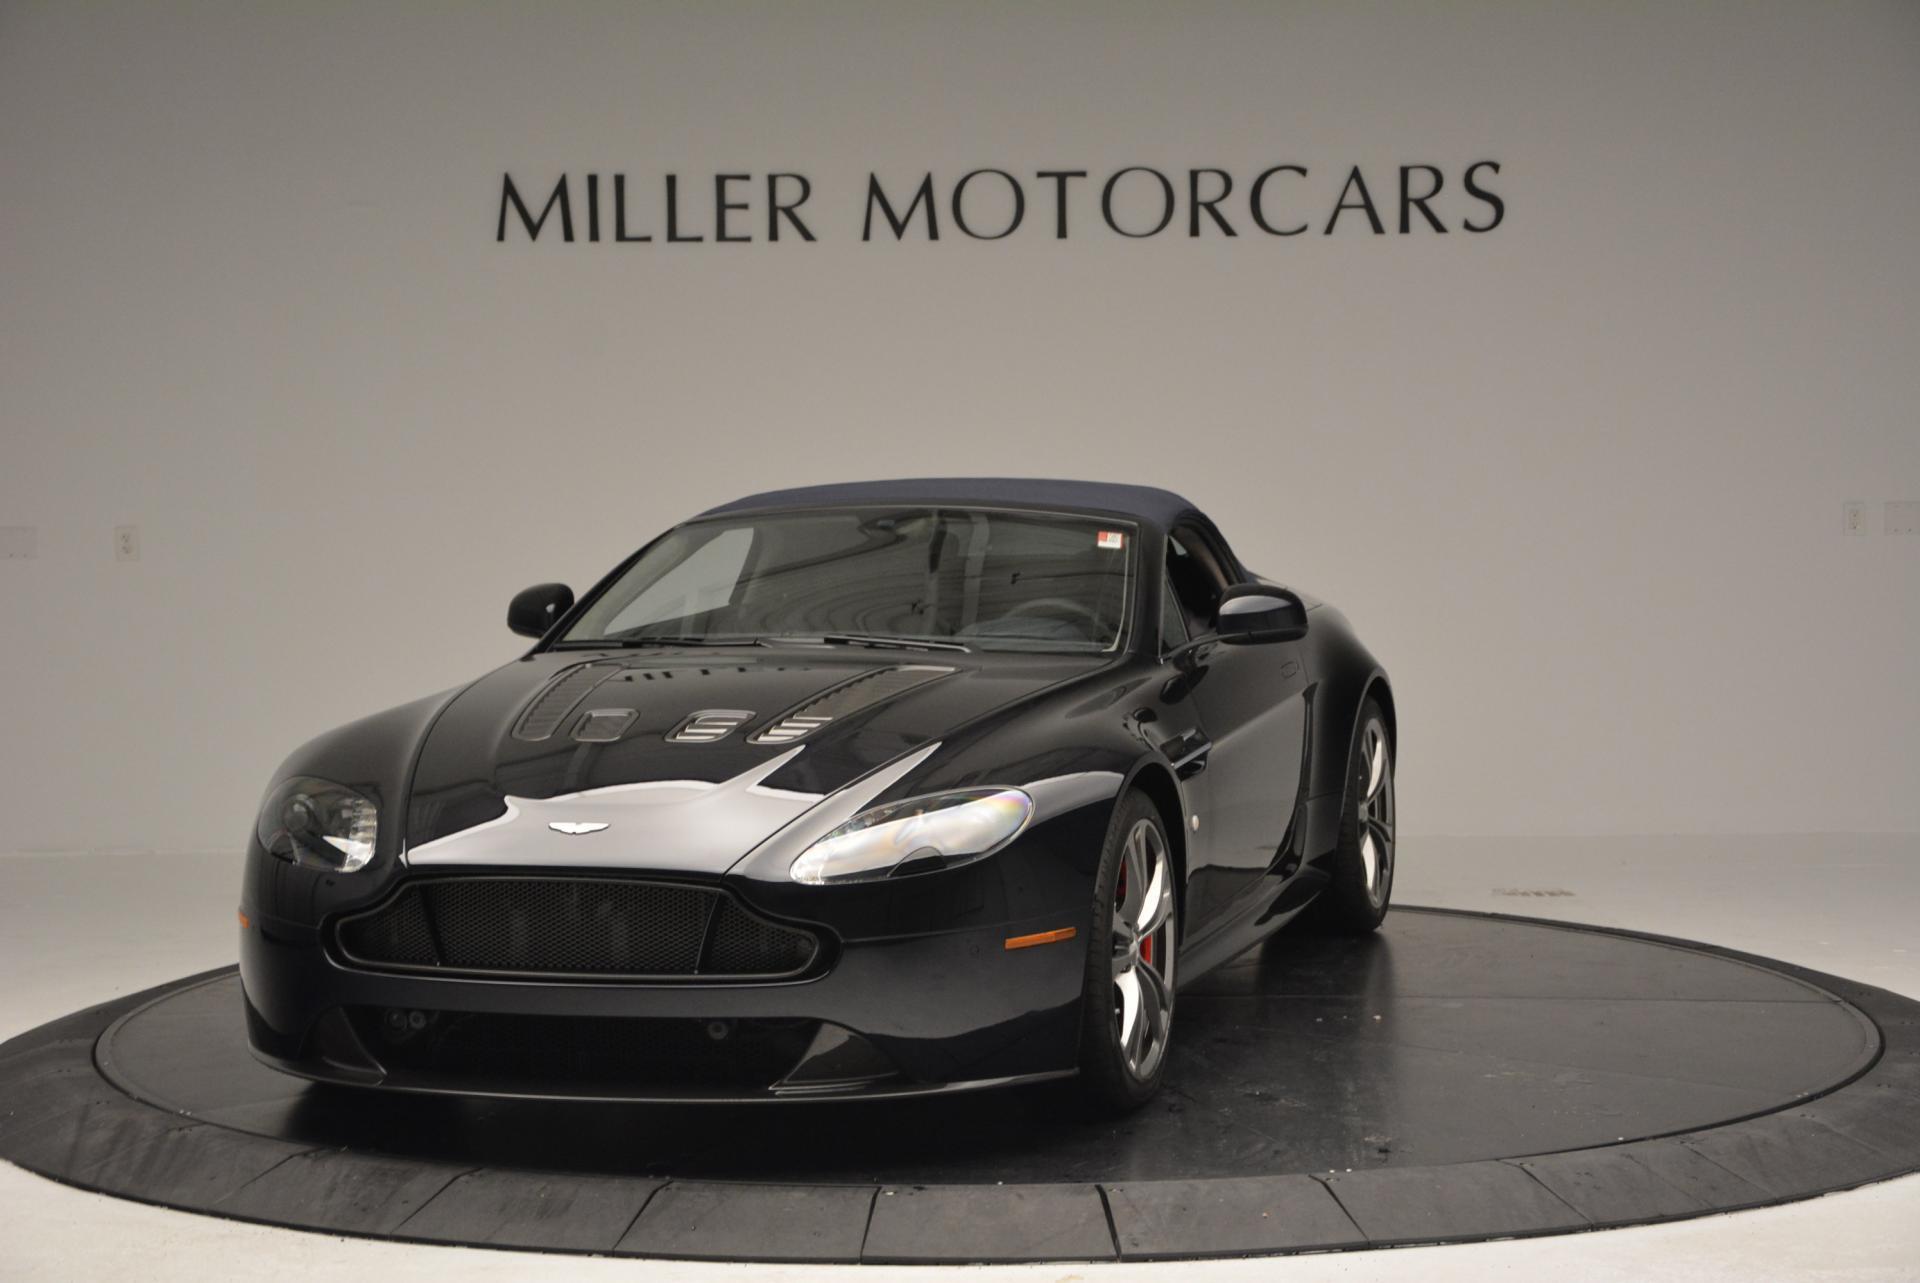 Used 2016 Aston Martin V12 Vantage S Convertible For Sale In Greenwich, CT. Alfa Romeo of Greenwich, 7579 89_p13